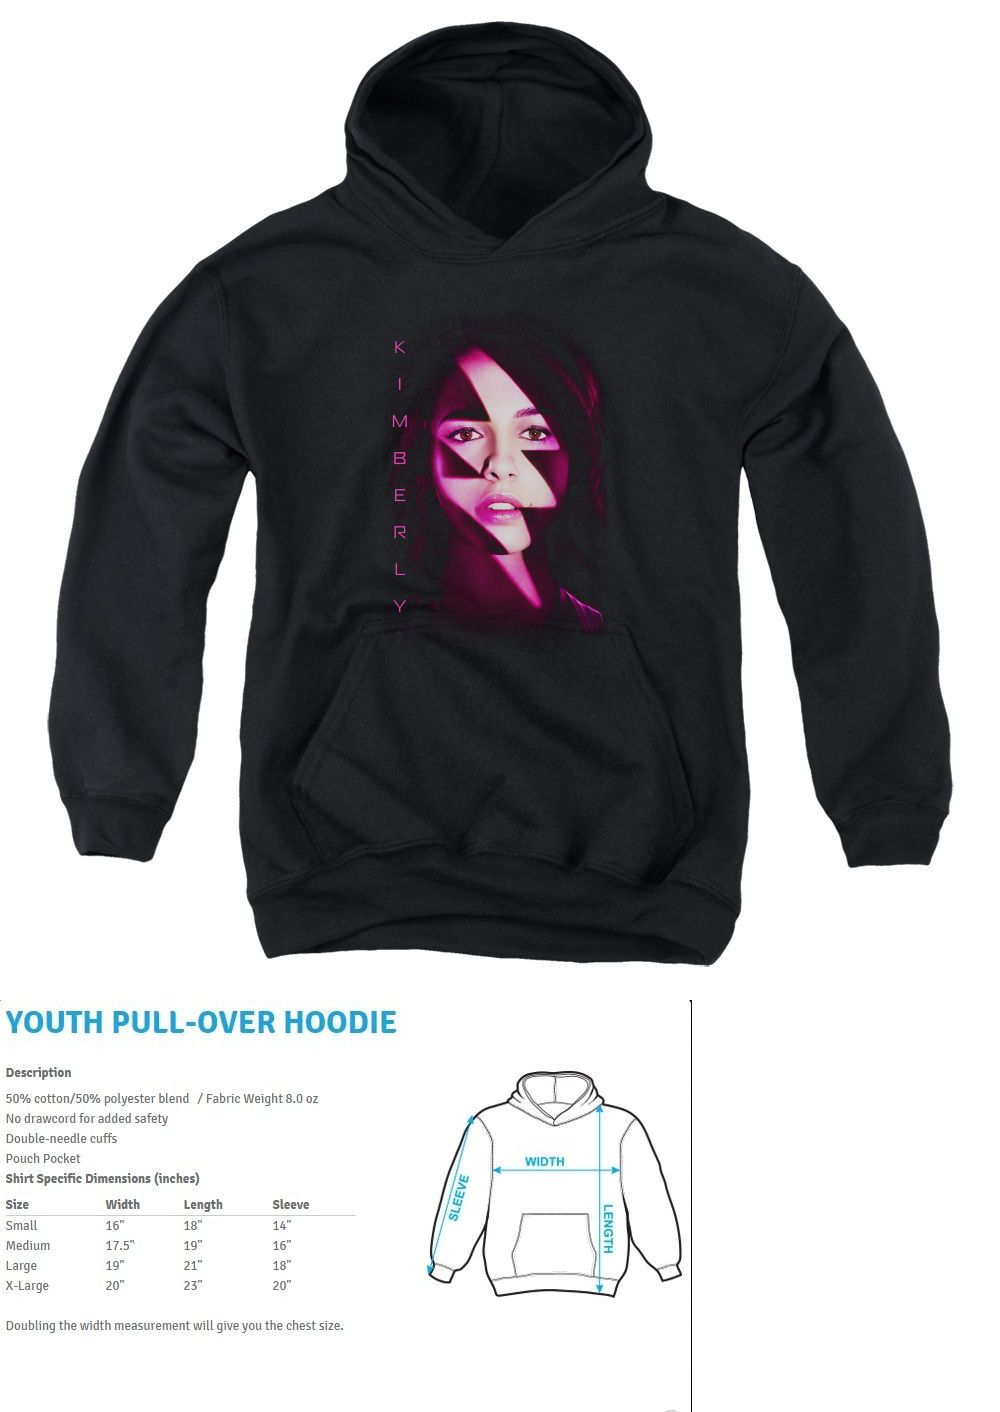 541dcd64 Sweatshirts and Hoodies 155200: Power Rangers Kimberly Bolt Kids Hoodie  Sweatshirt Sm-Xl Boys Girls Sz 6-20 -> BUY IT NOW ONLY: $41.36 on eBay!